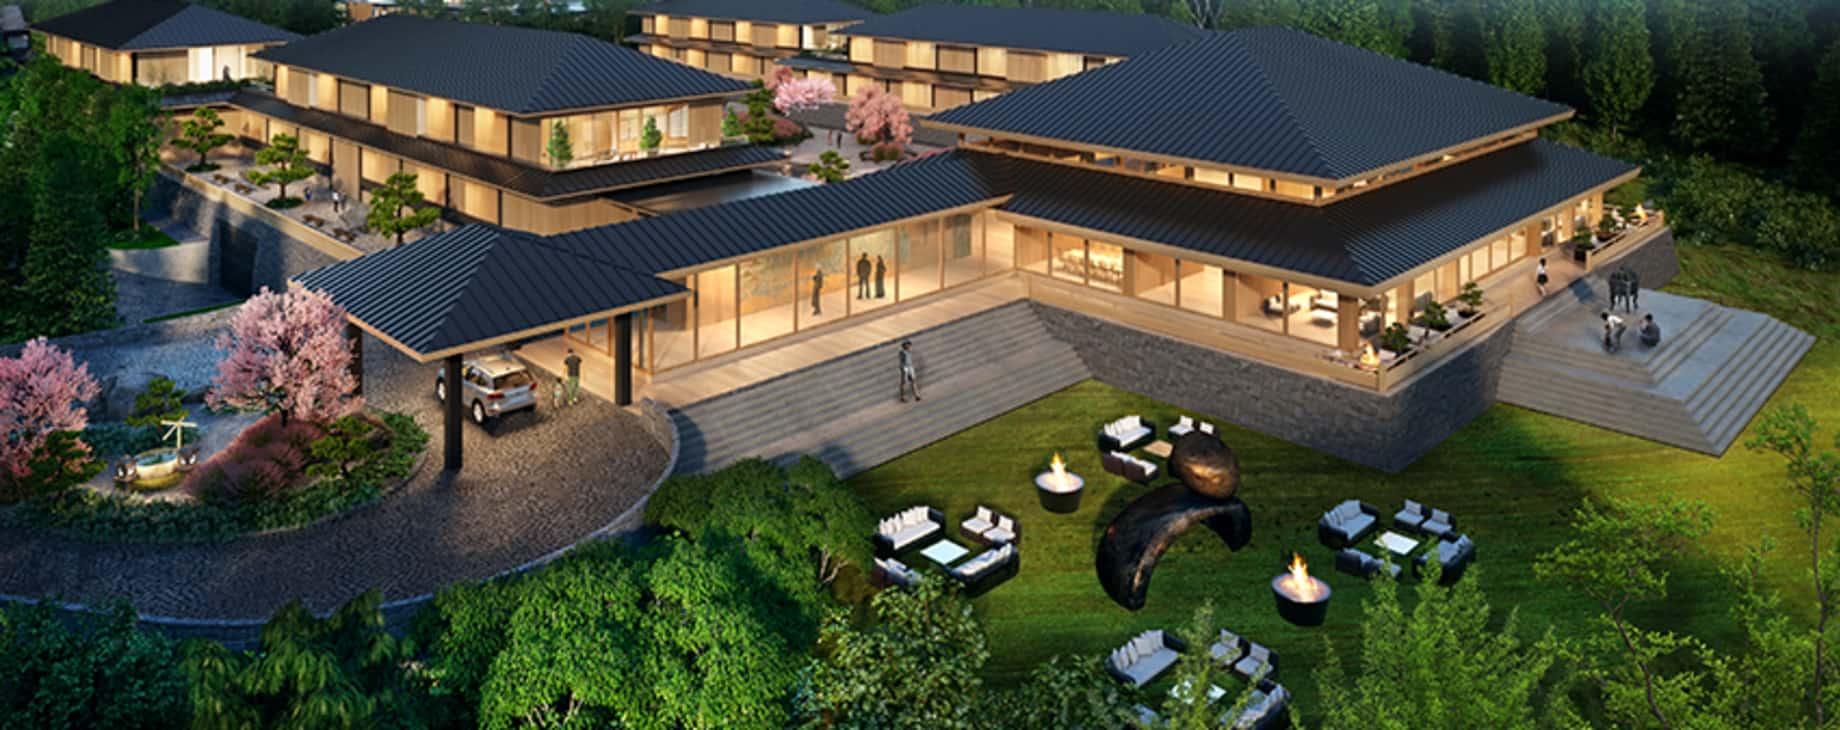 The Pavilions Niseko